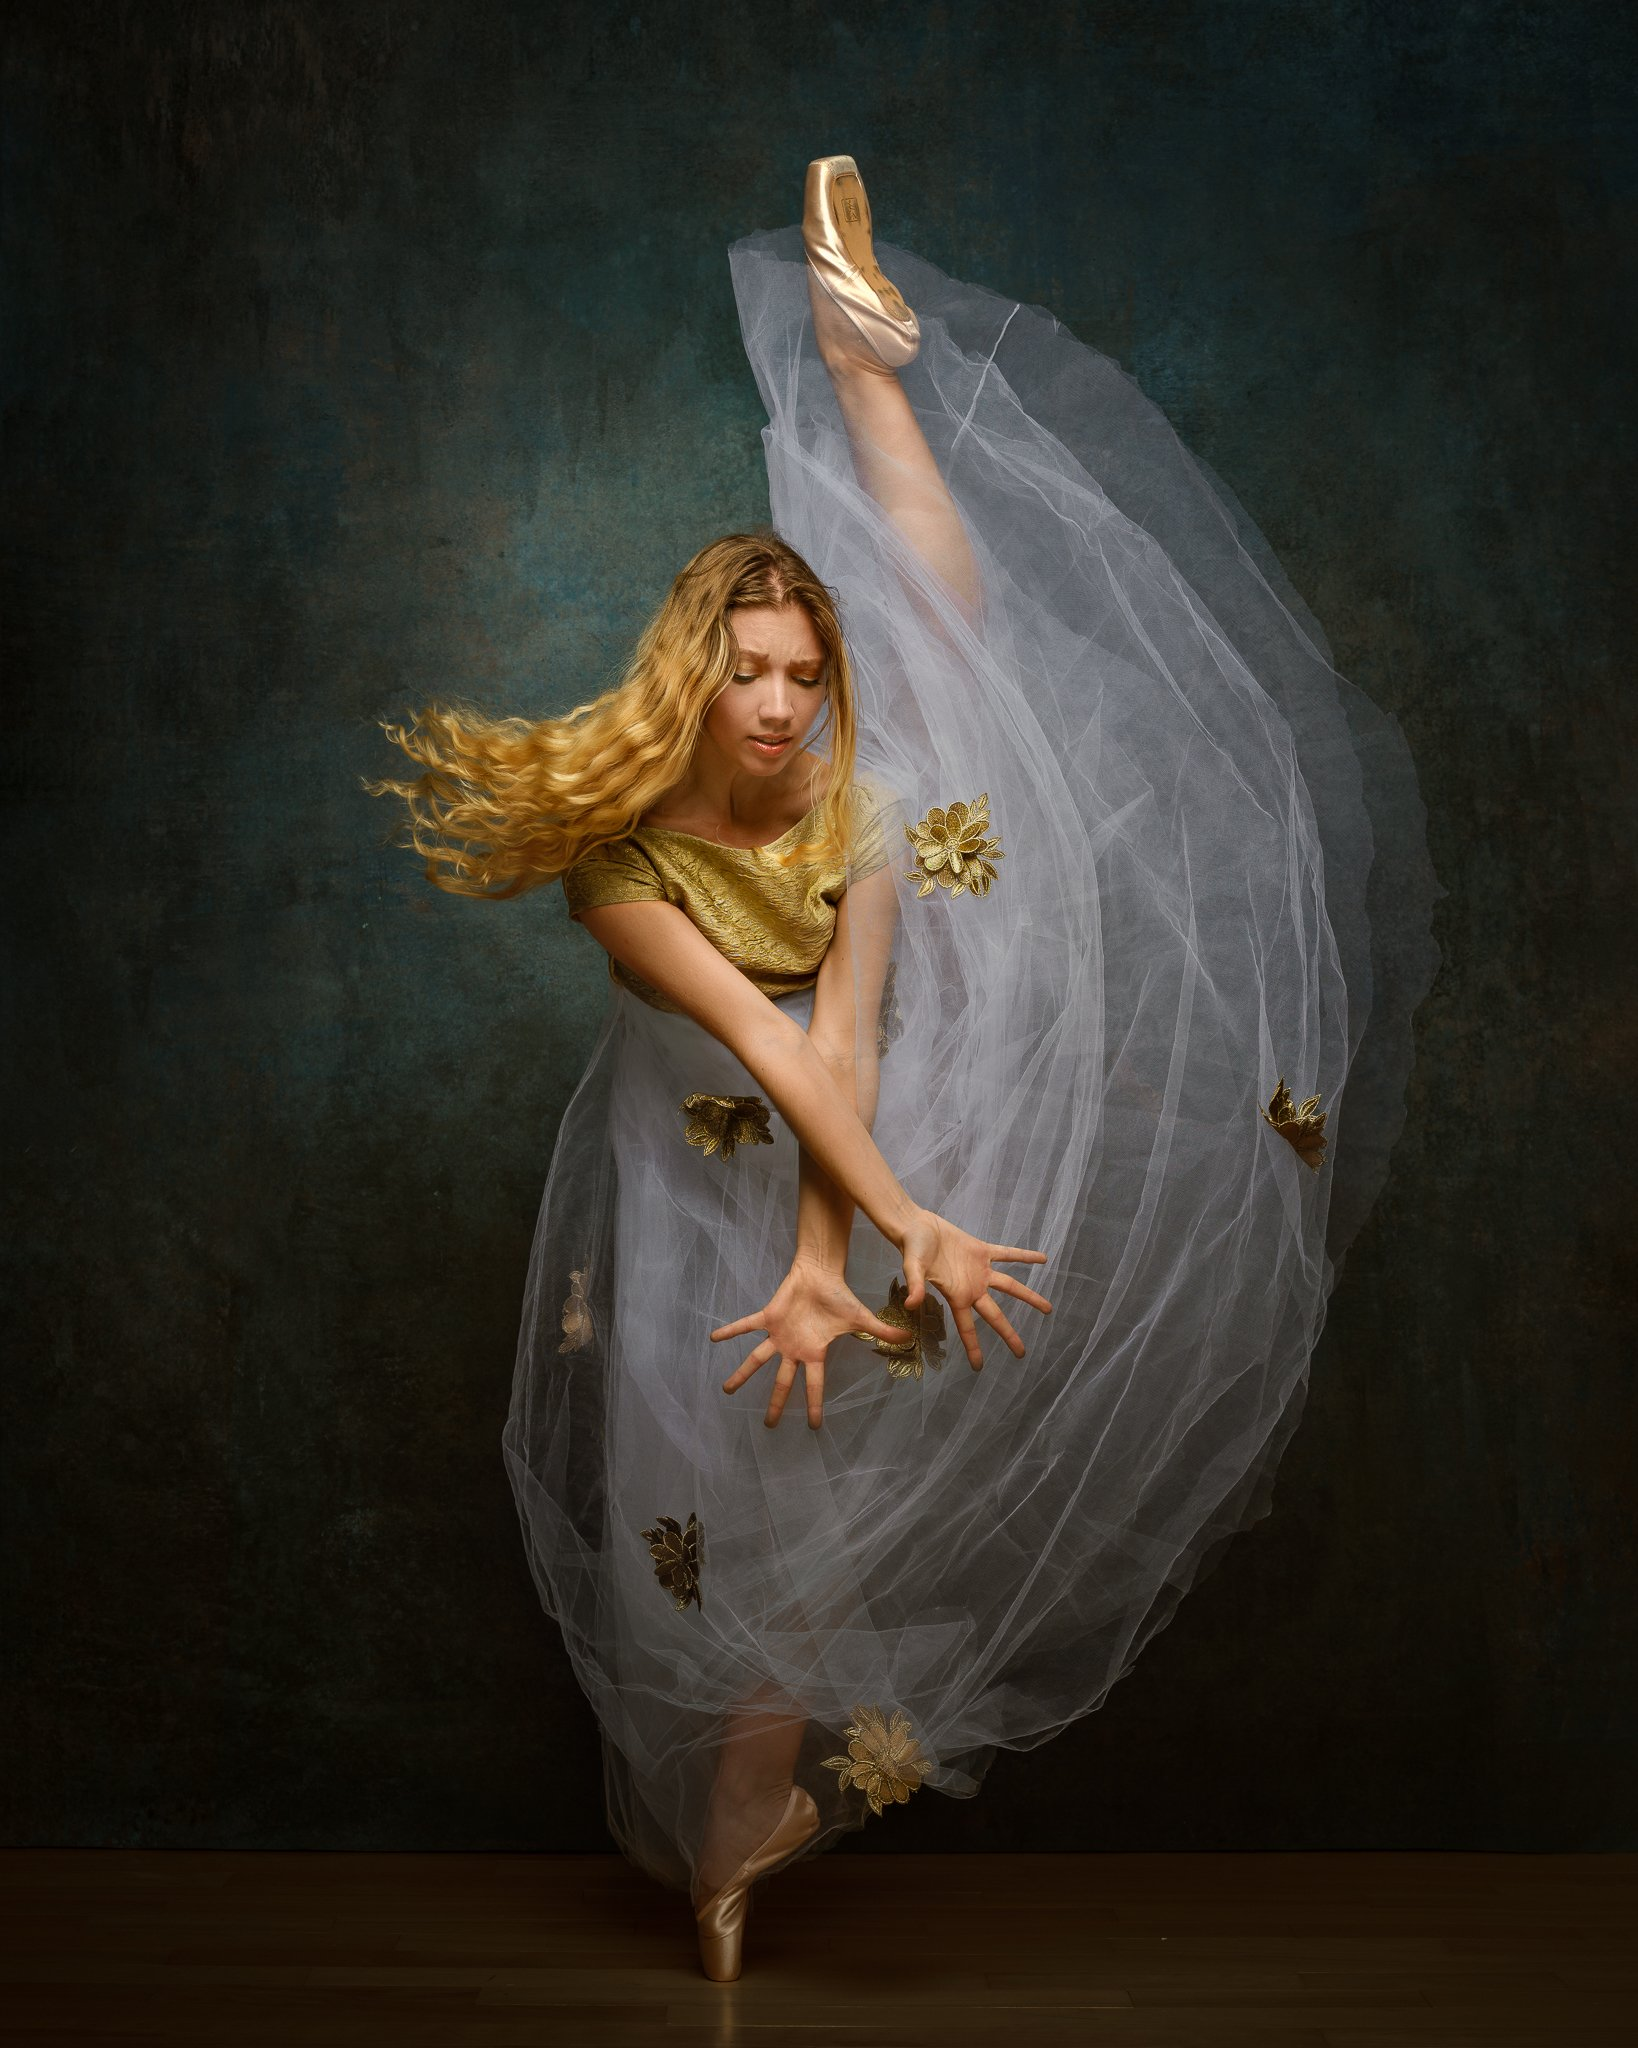 girl, female, pretty, model, fashion, portrait, dancer, ballet, Saulius Ke